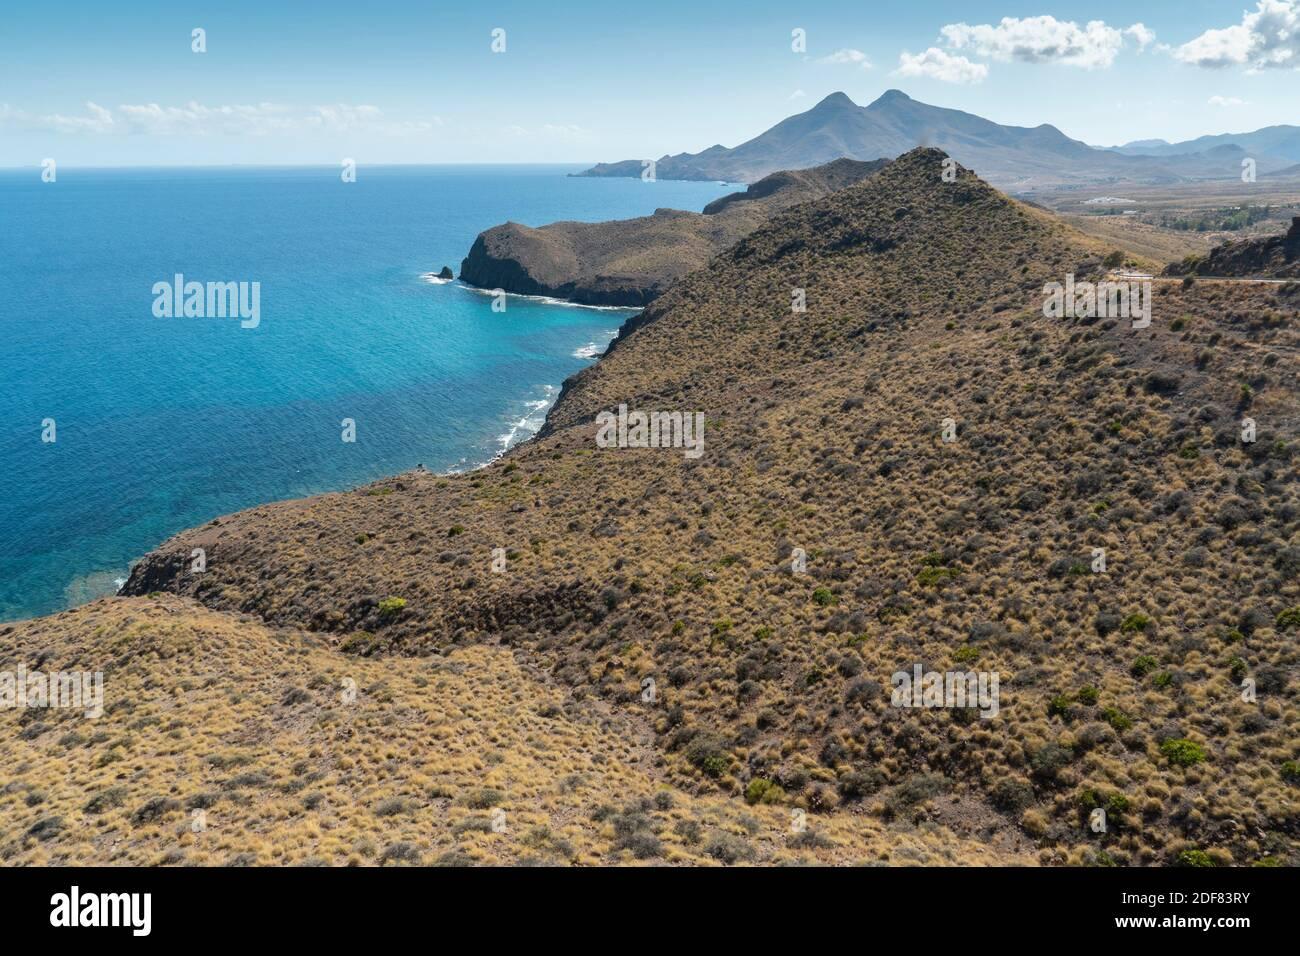 Mediterranean sea from Amatista viewpoint in Cabo de Gata nature reserve Almeria Andalusia Spain. Stock Photo